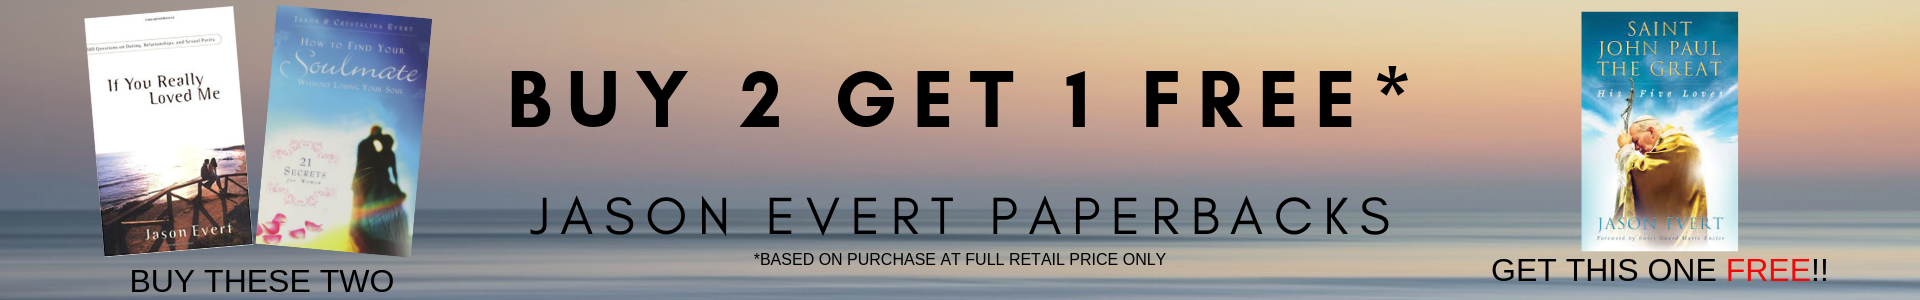 buy-2-get-1-free.png